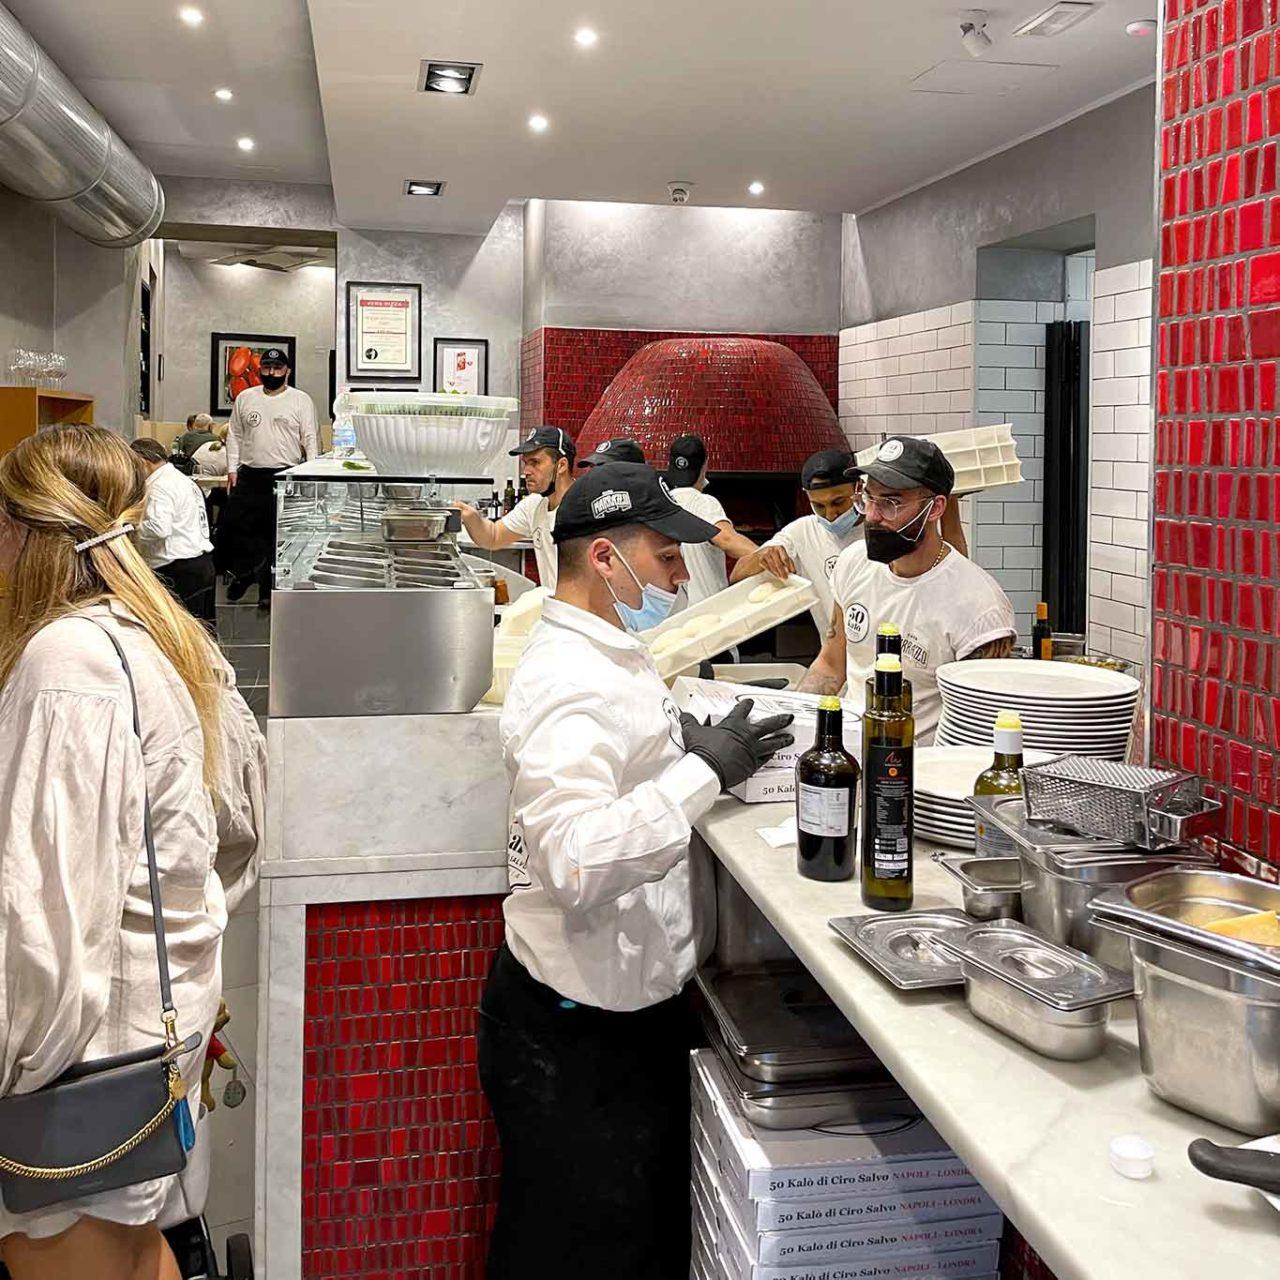 pizzeria 50 Kalò di Ciro Salvo bancone